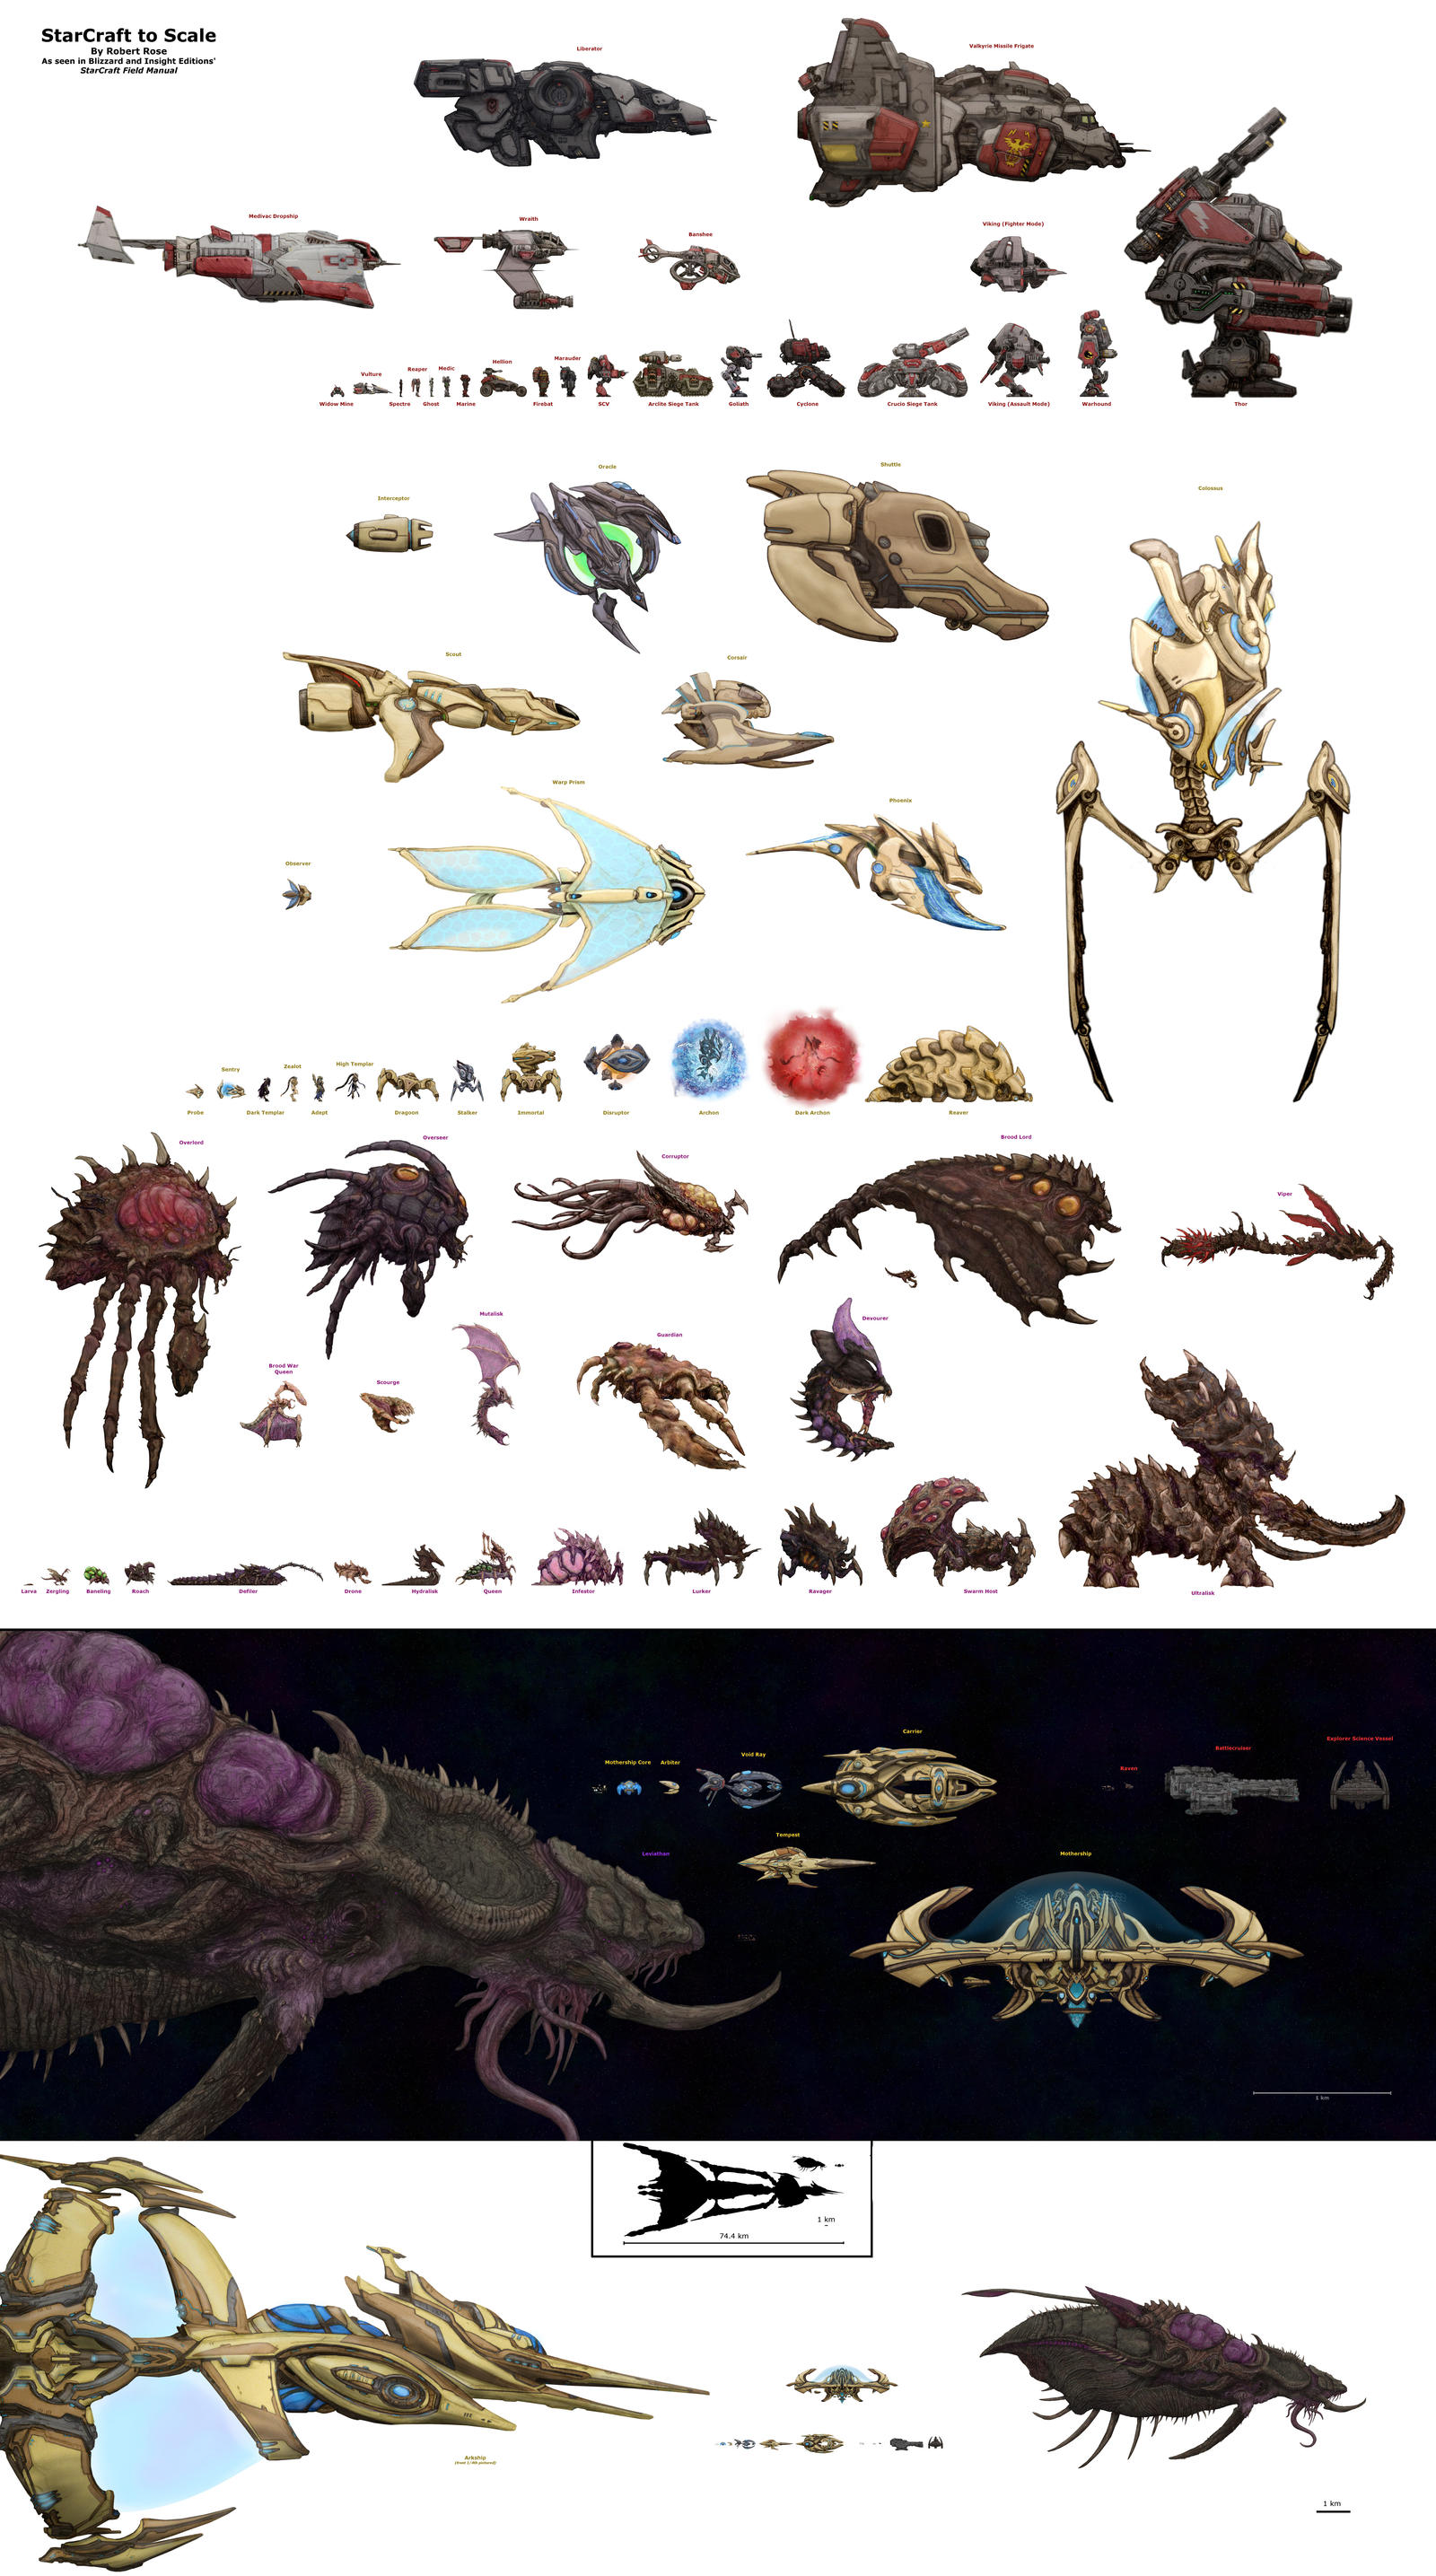 StarCraft to Scale by xiaorobear on DeviantArt